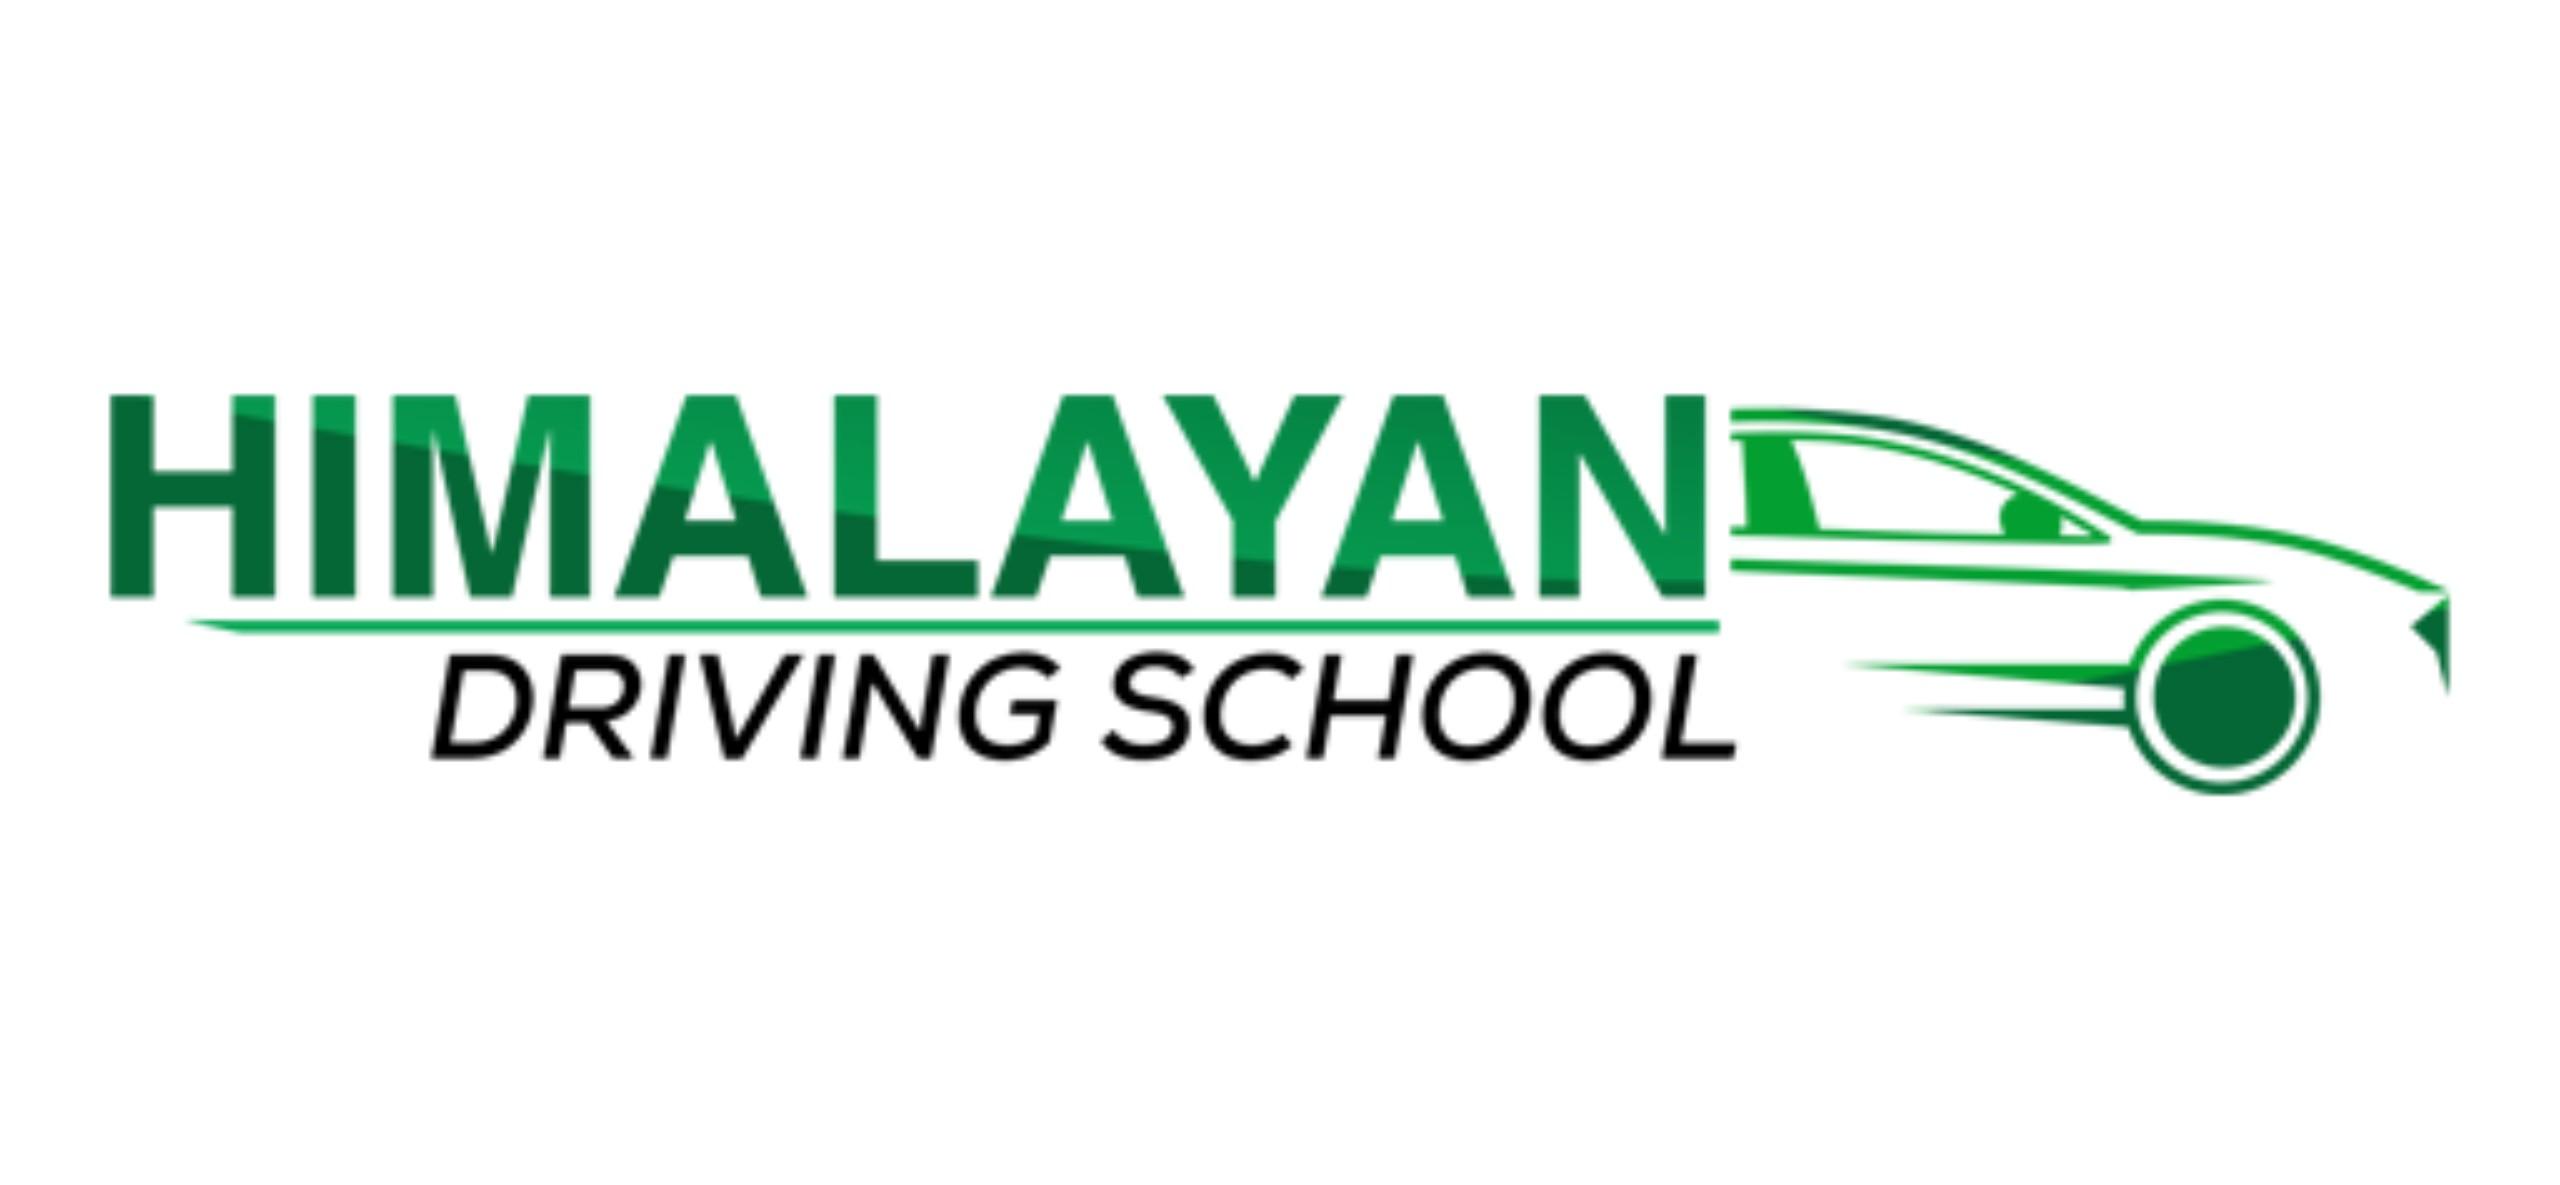 Himalayan Driving School